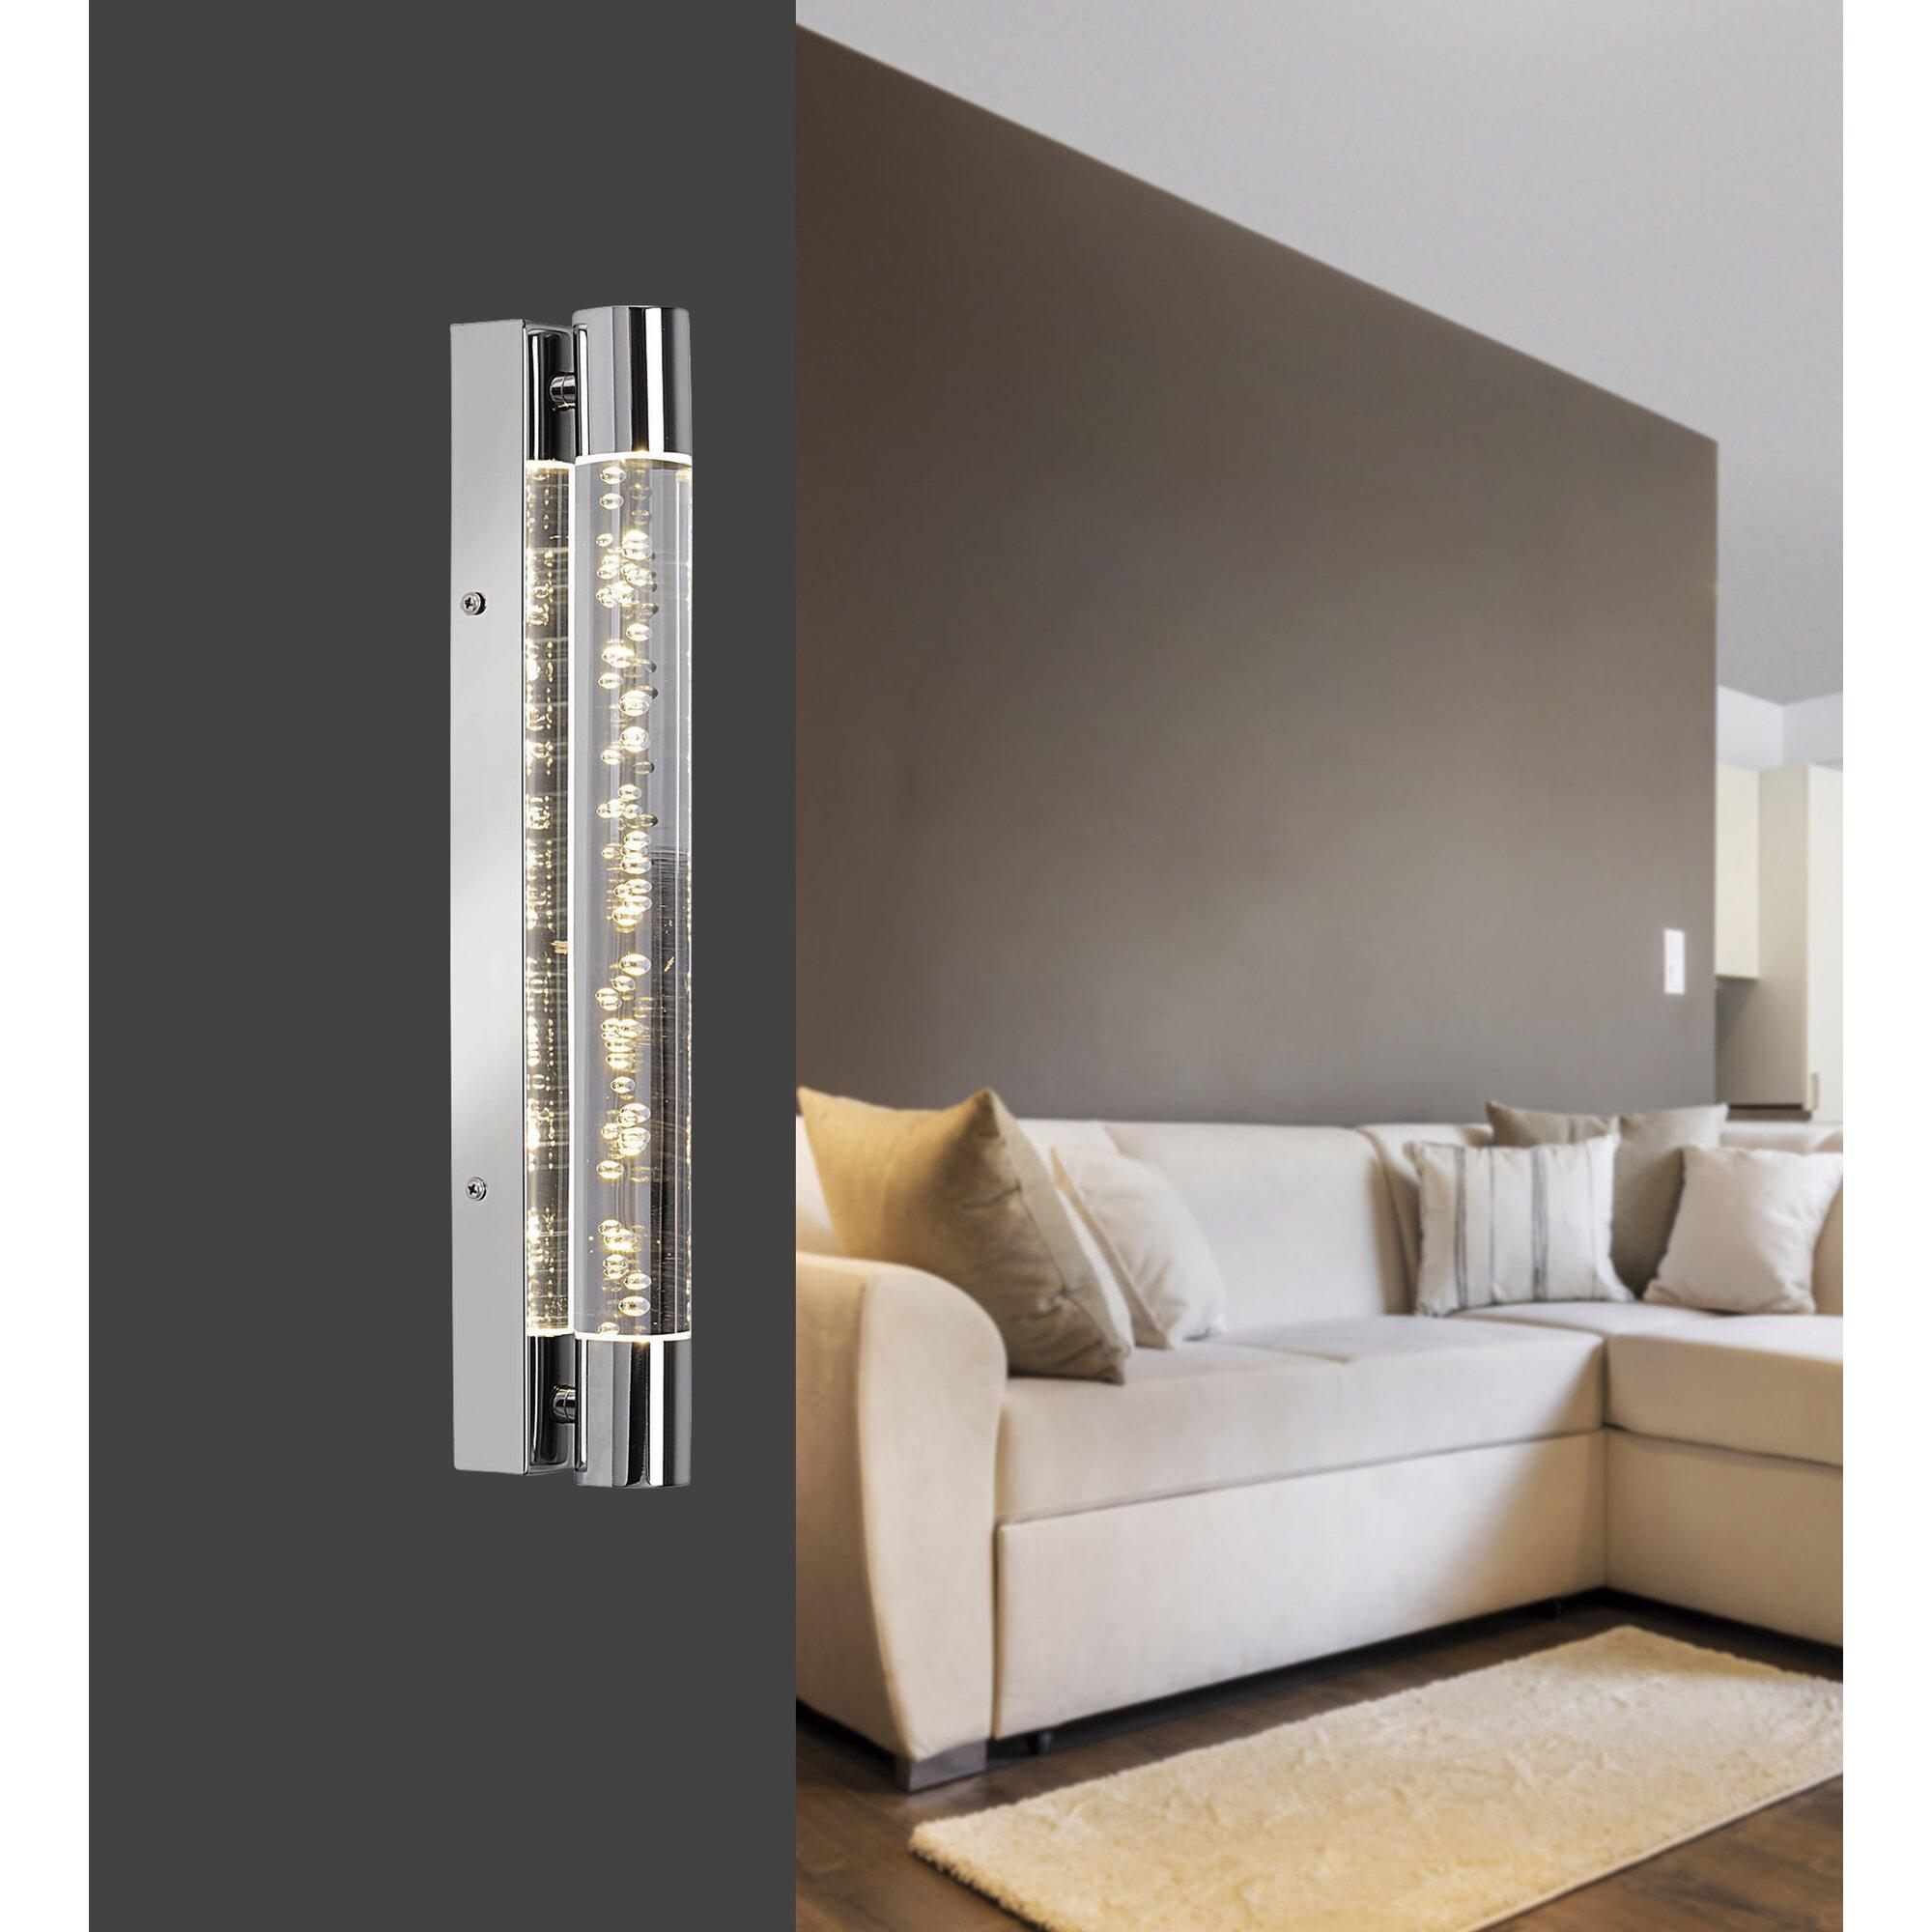 paul neuhaus bubbles 2 light wall light. Black Bedroom Furniture Sets. Home Design Ideas